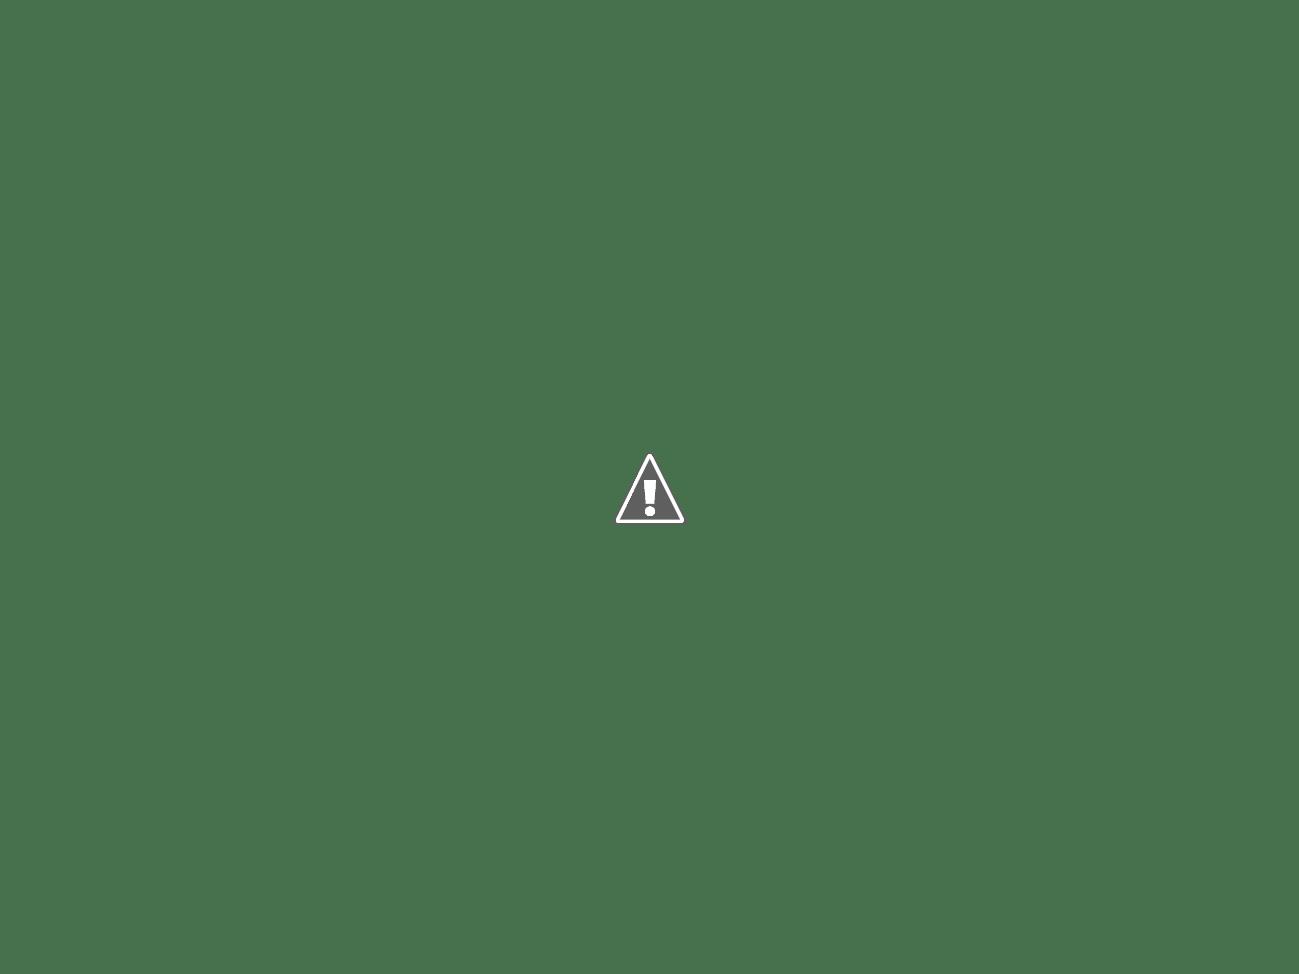 the cedar tree root